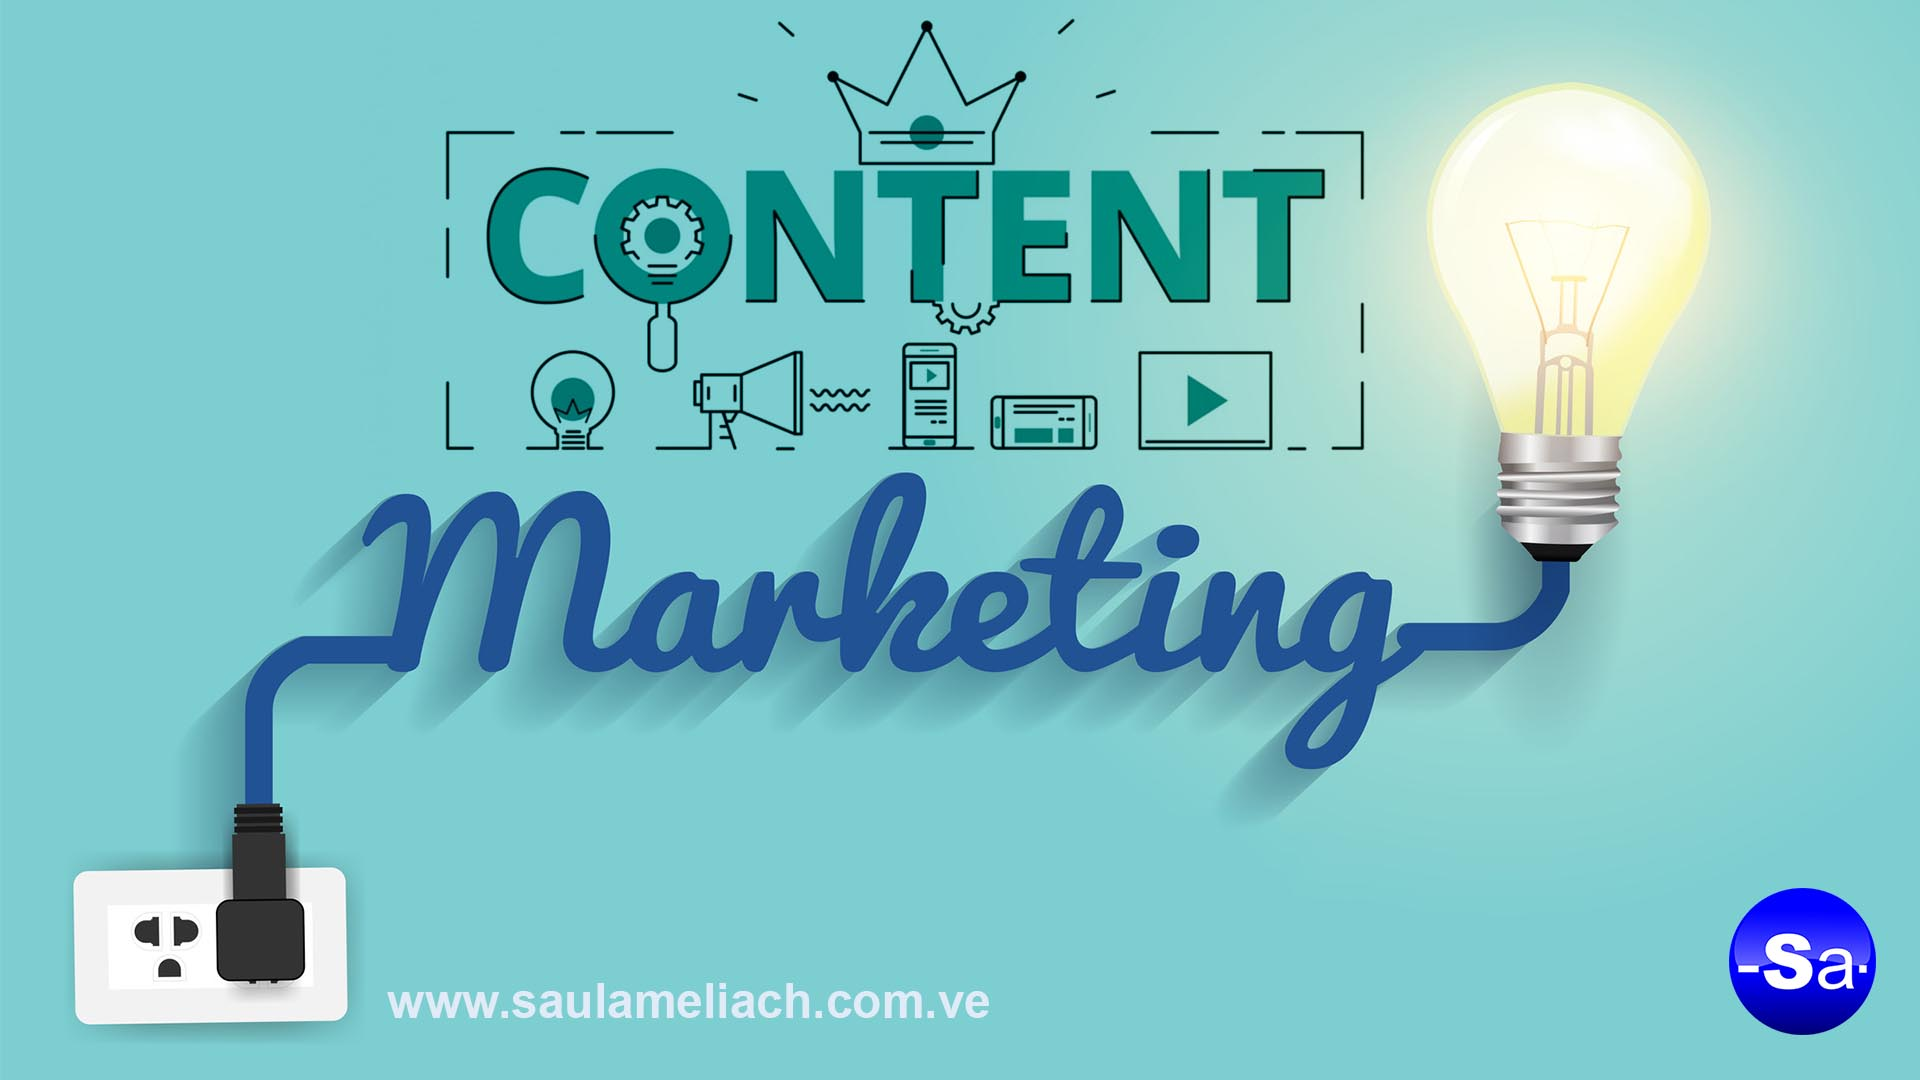 Saul Ameliach - Content Marketing - engagement - tendencia para generar engagement